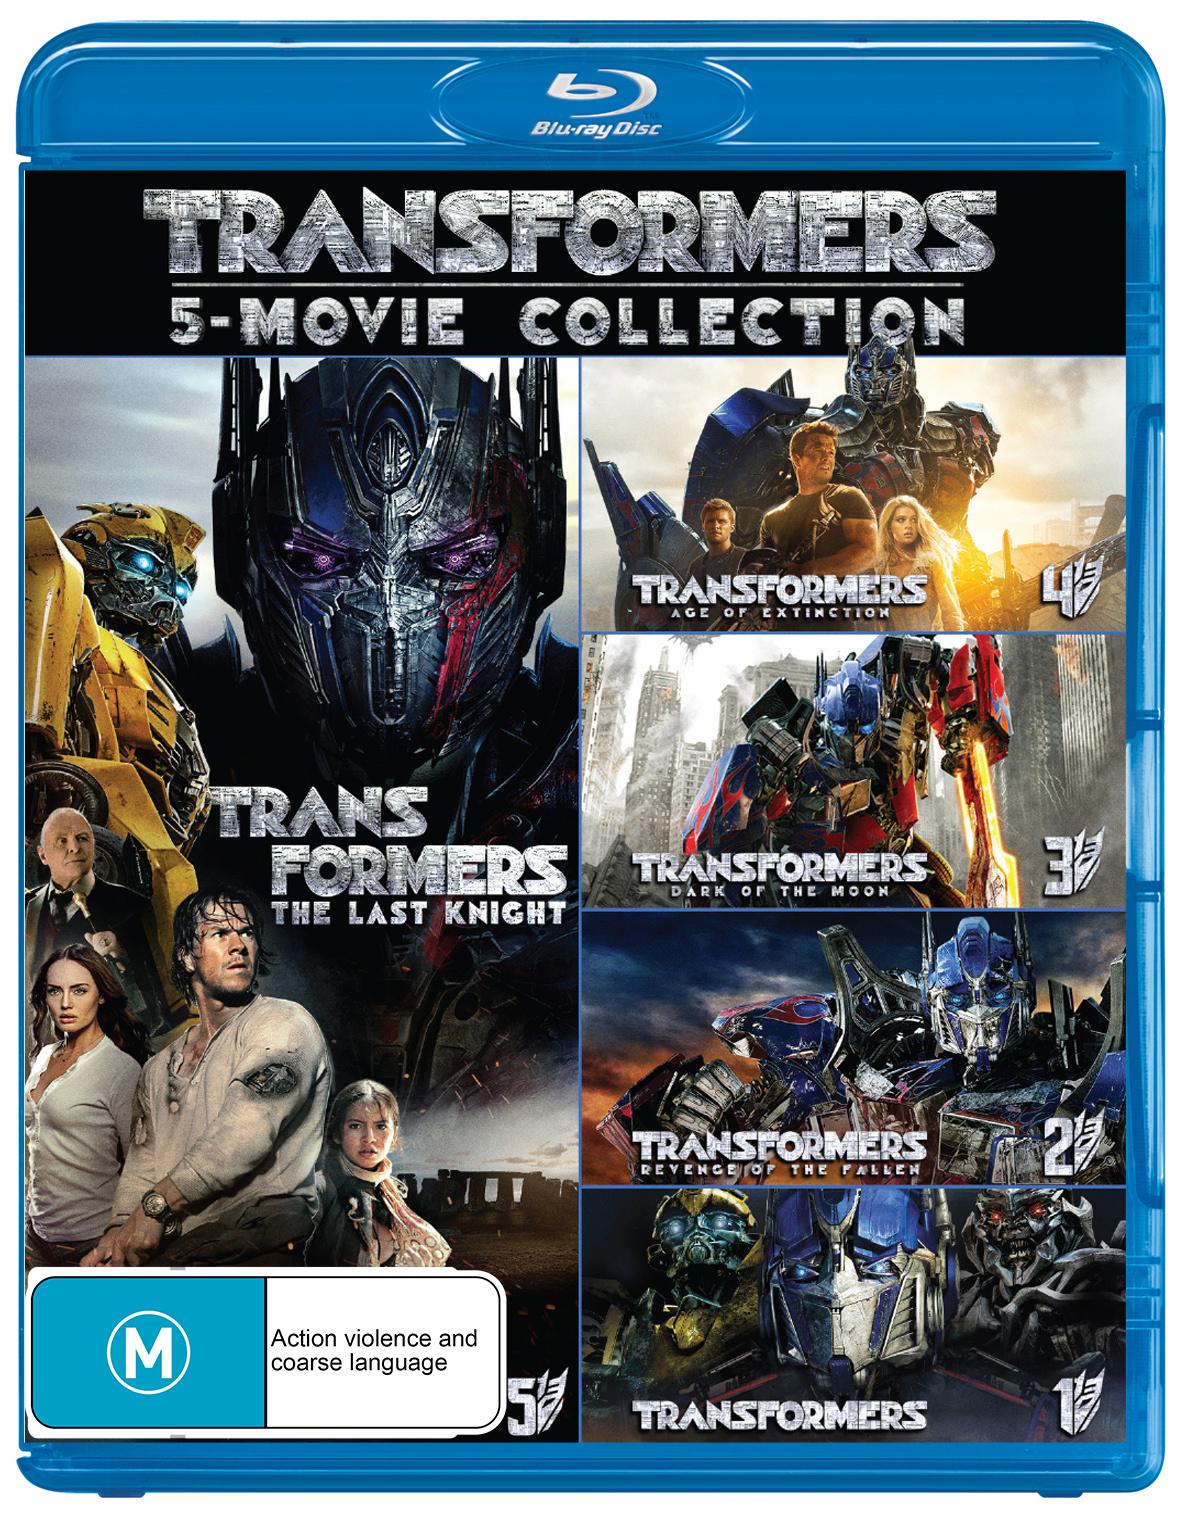 Transformers - 1-5 Boxset on Blu-ray image